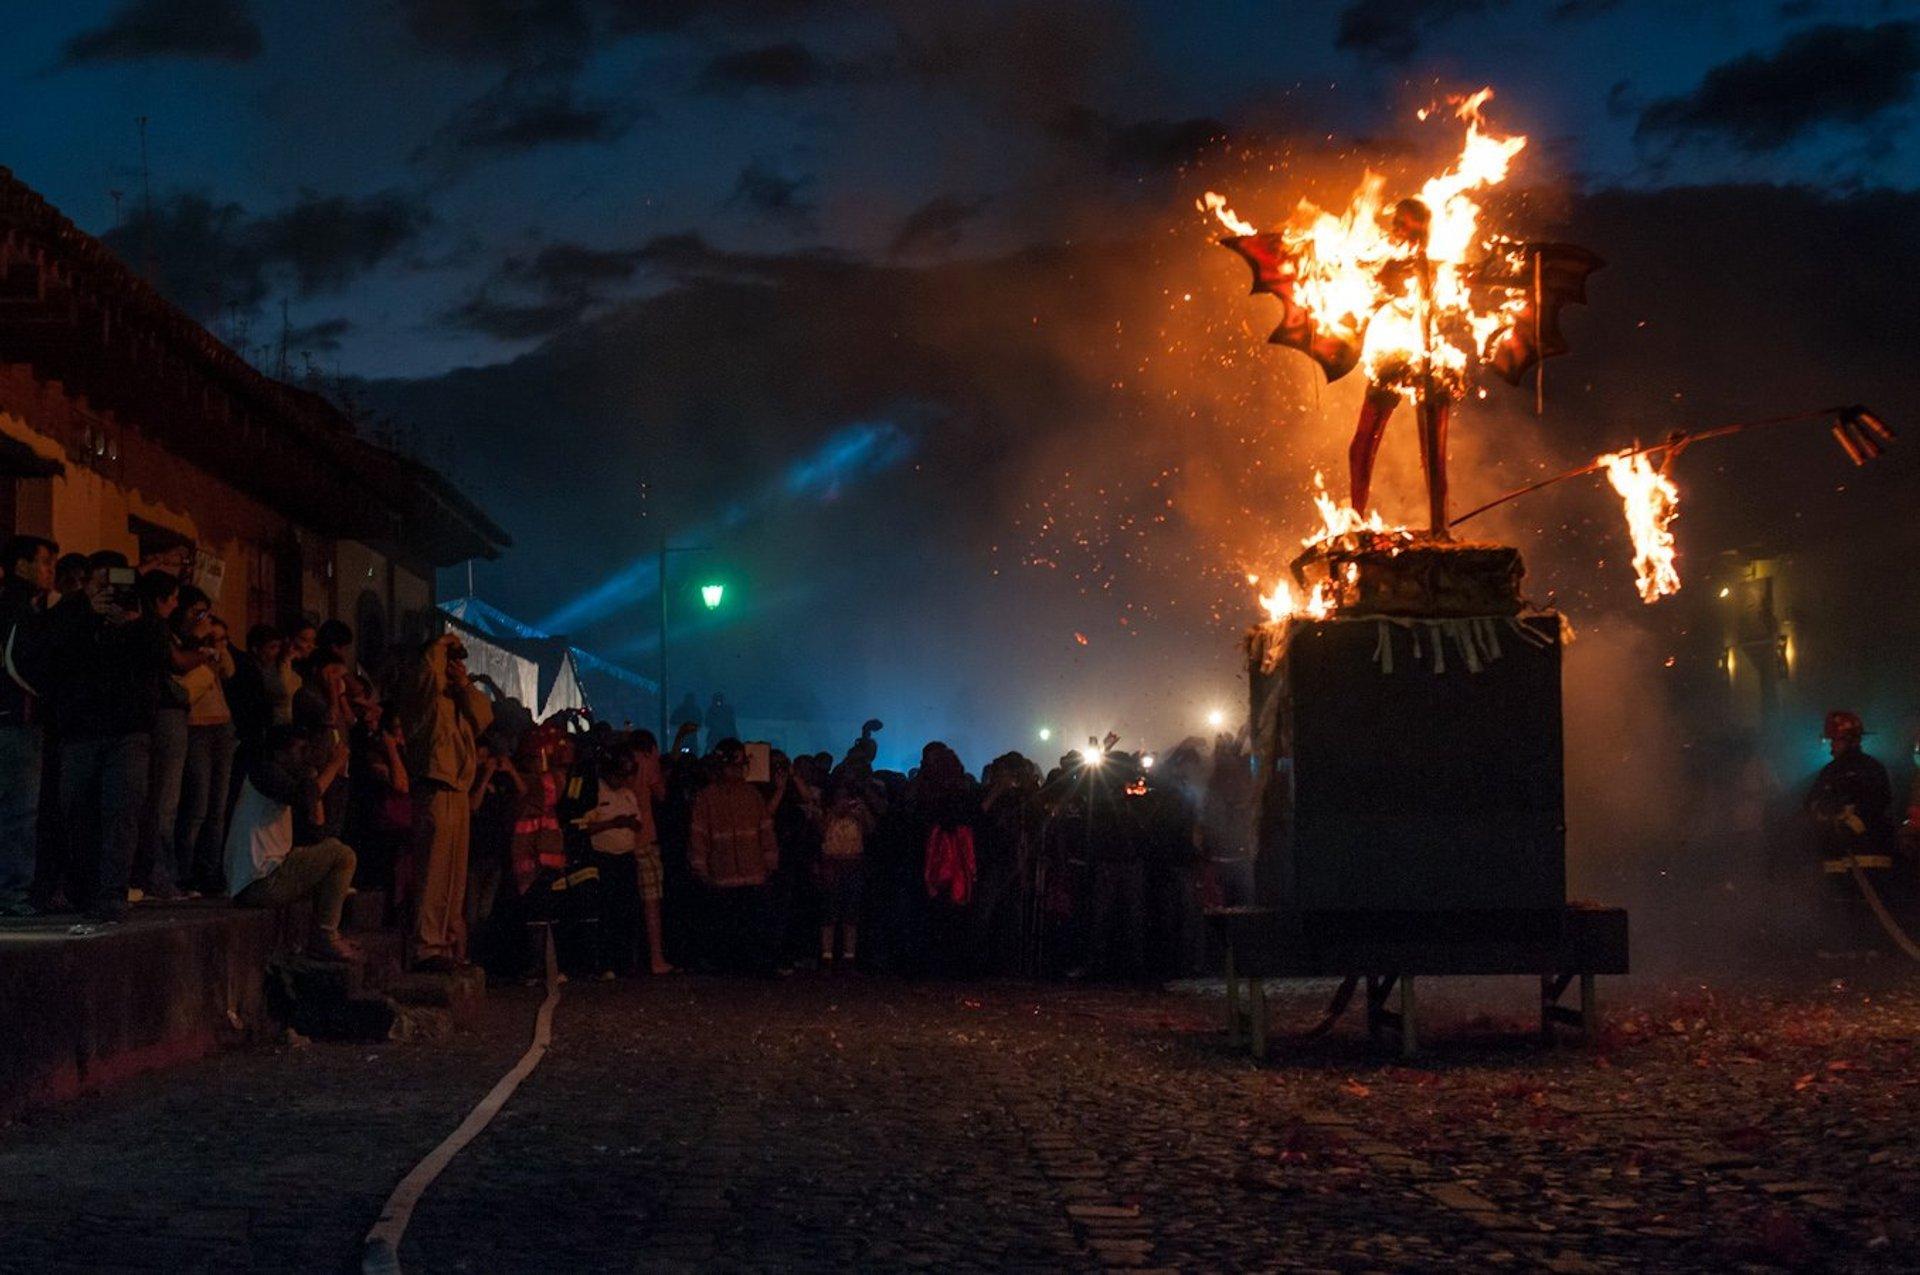 Quema del Diablo or Burning the Devil in Guatemala - Best Season